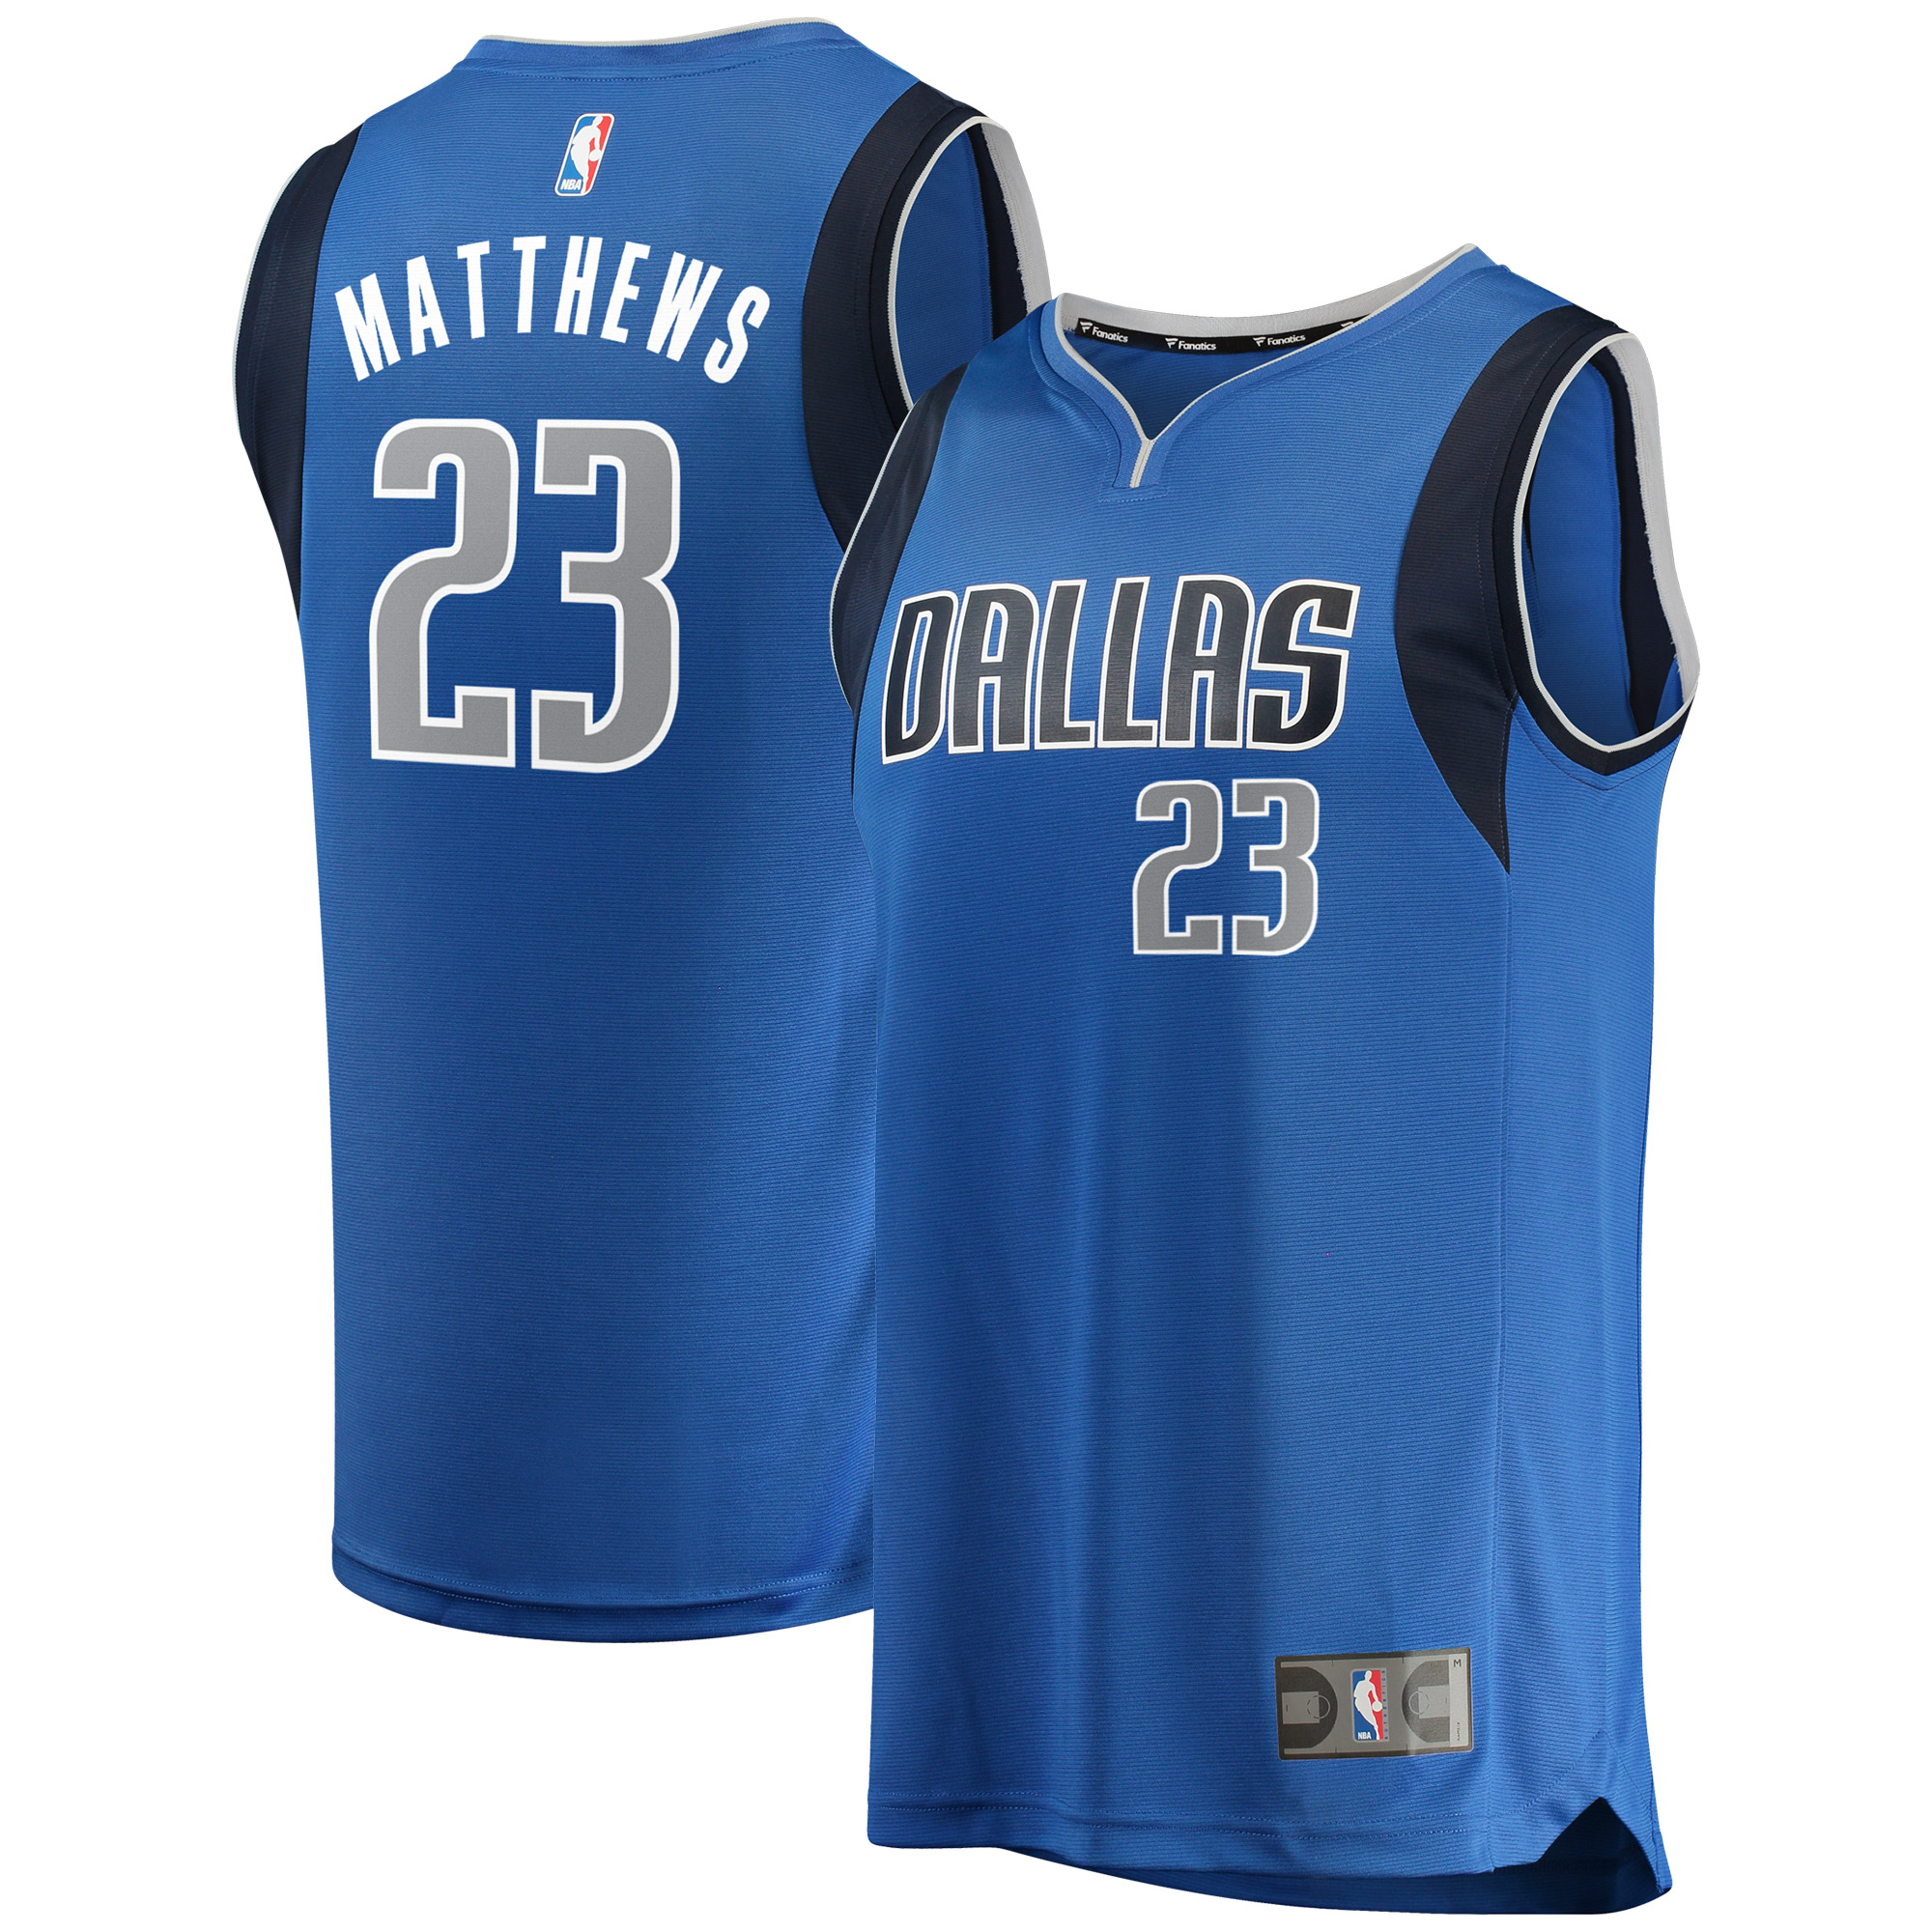 Wesley Matthews Dallas Mavericks Fanatics Branded Fast Break Replica Team Color Player Jersey Royal - Icon Edition